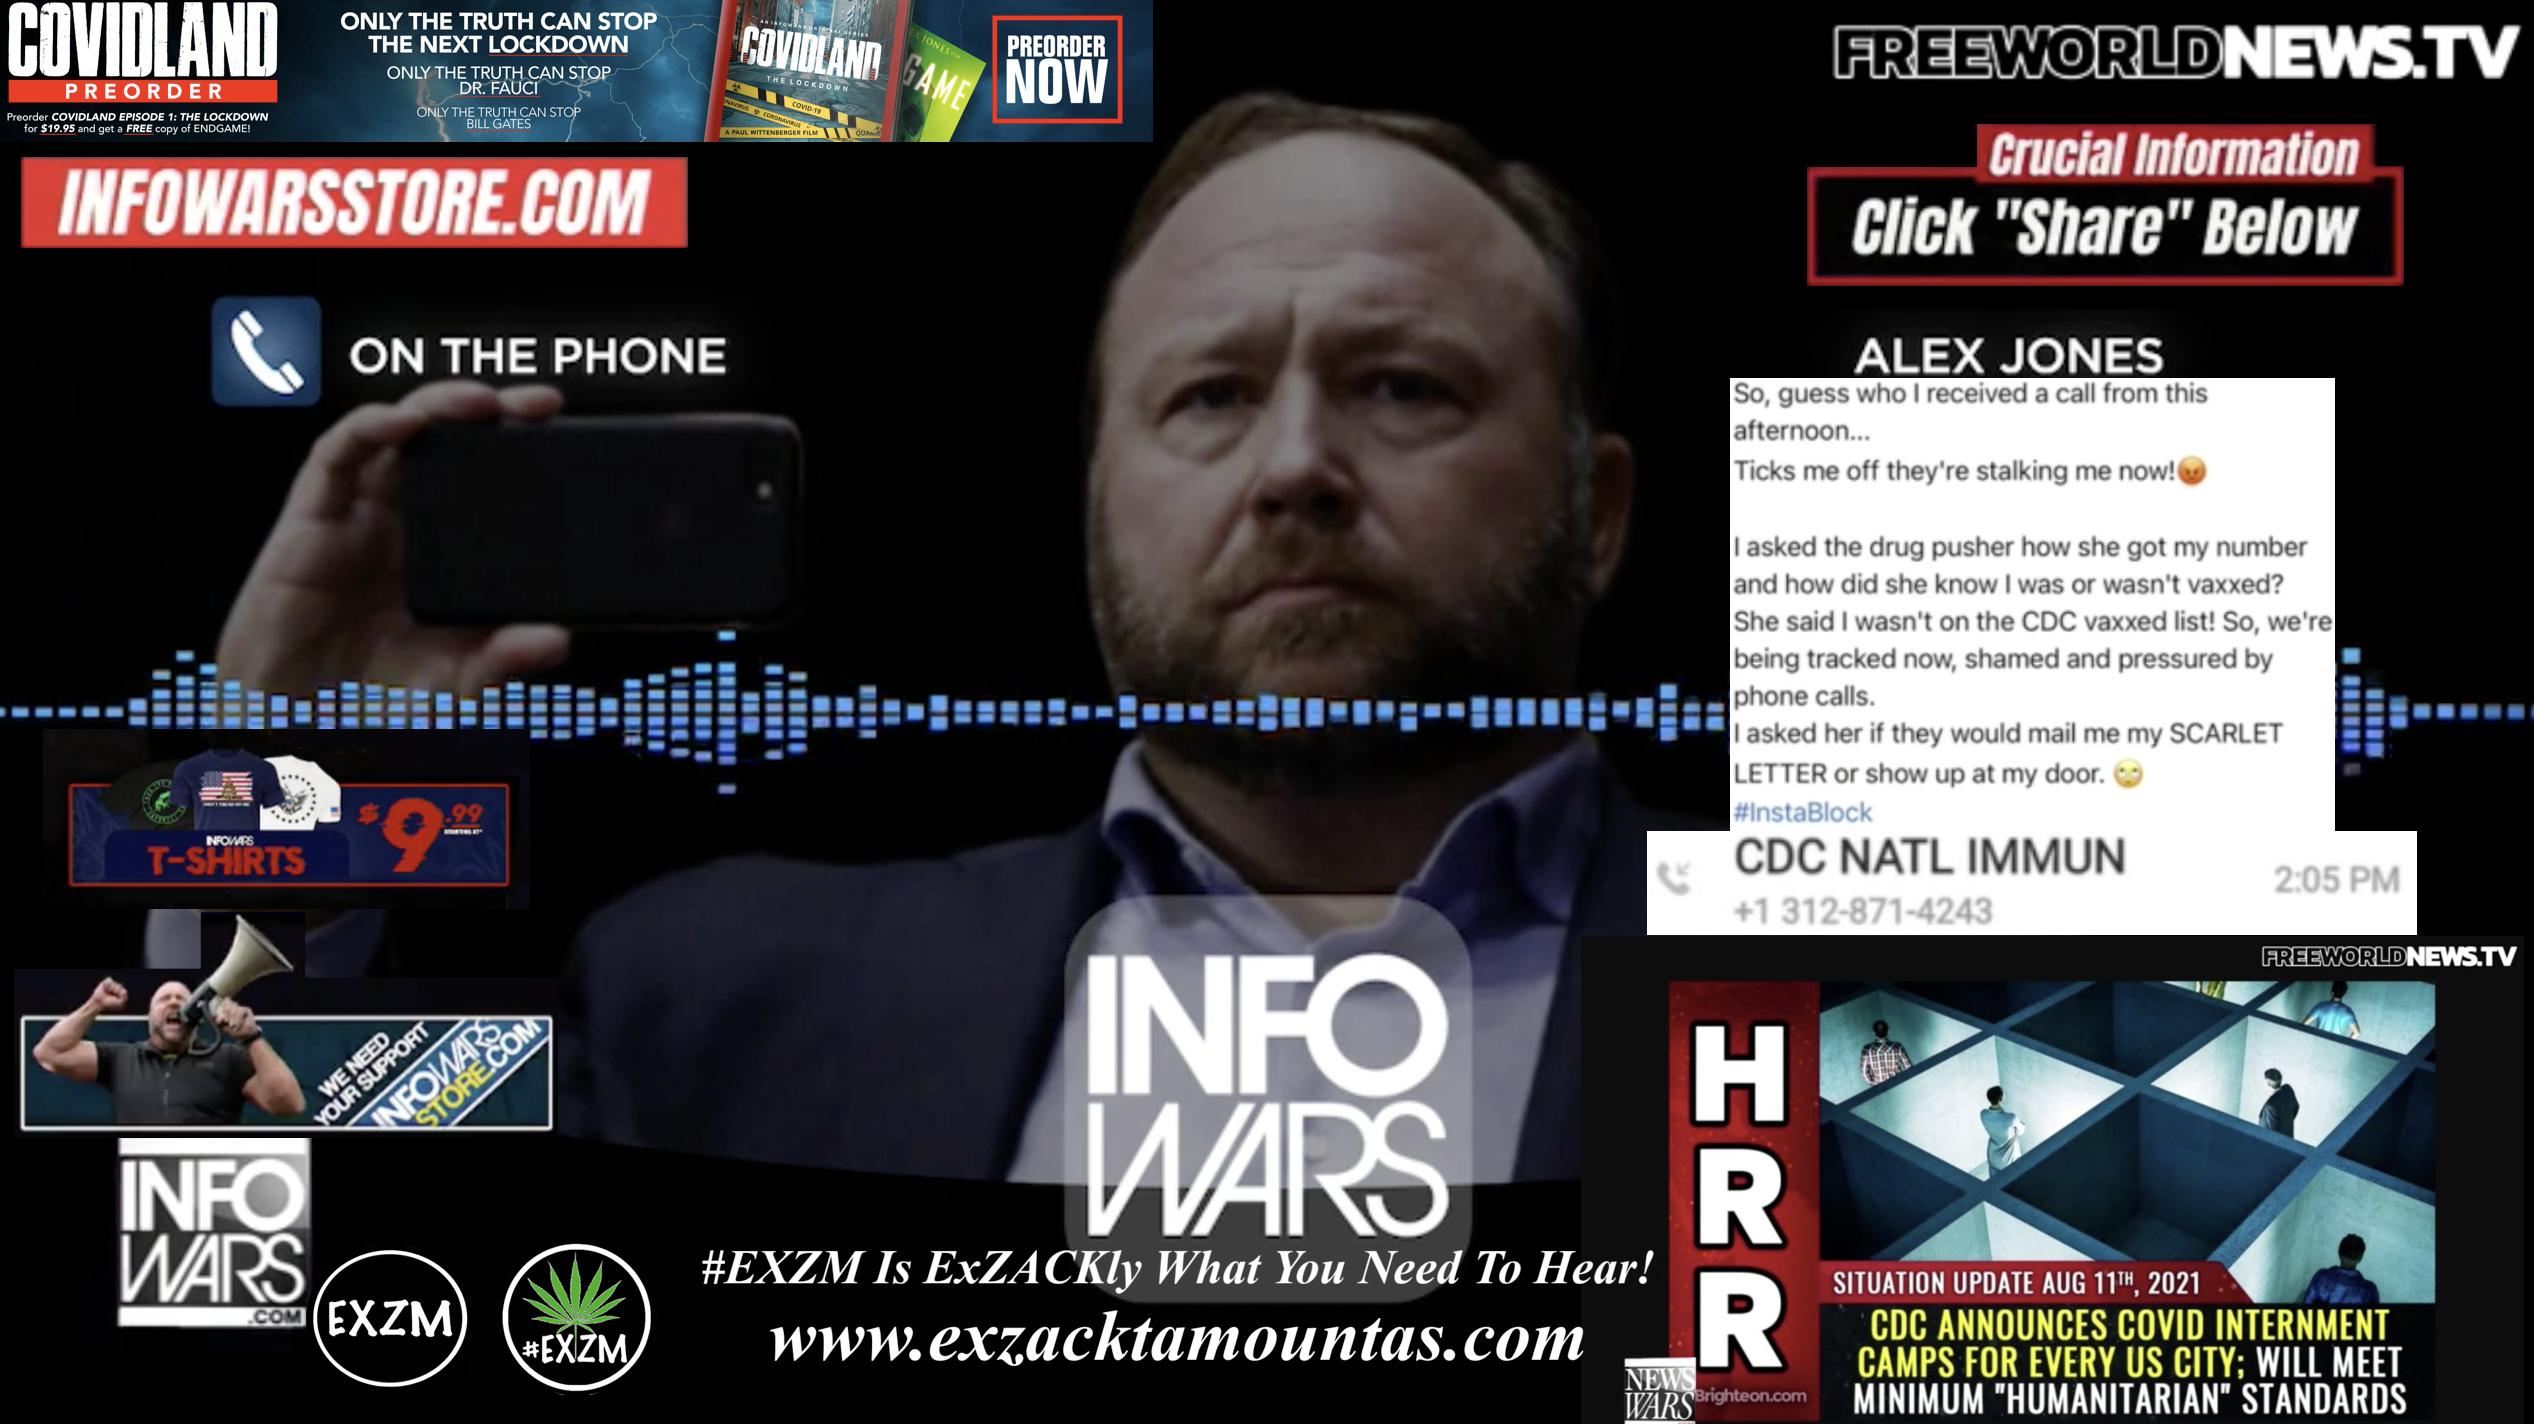 Alex Jones Live In Infowars Studio Free World News TV EXZM Zack Mount September 30th 2021 copy